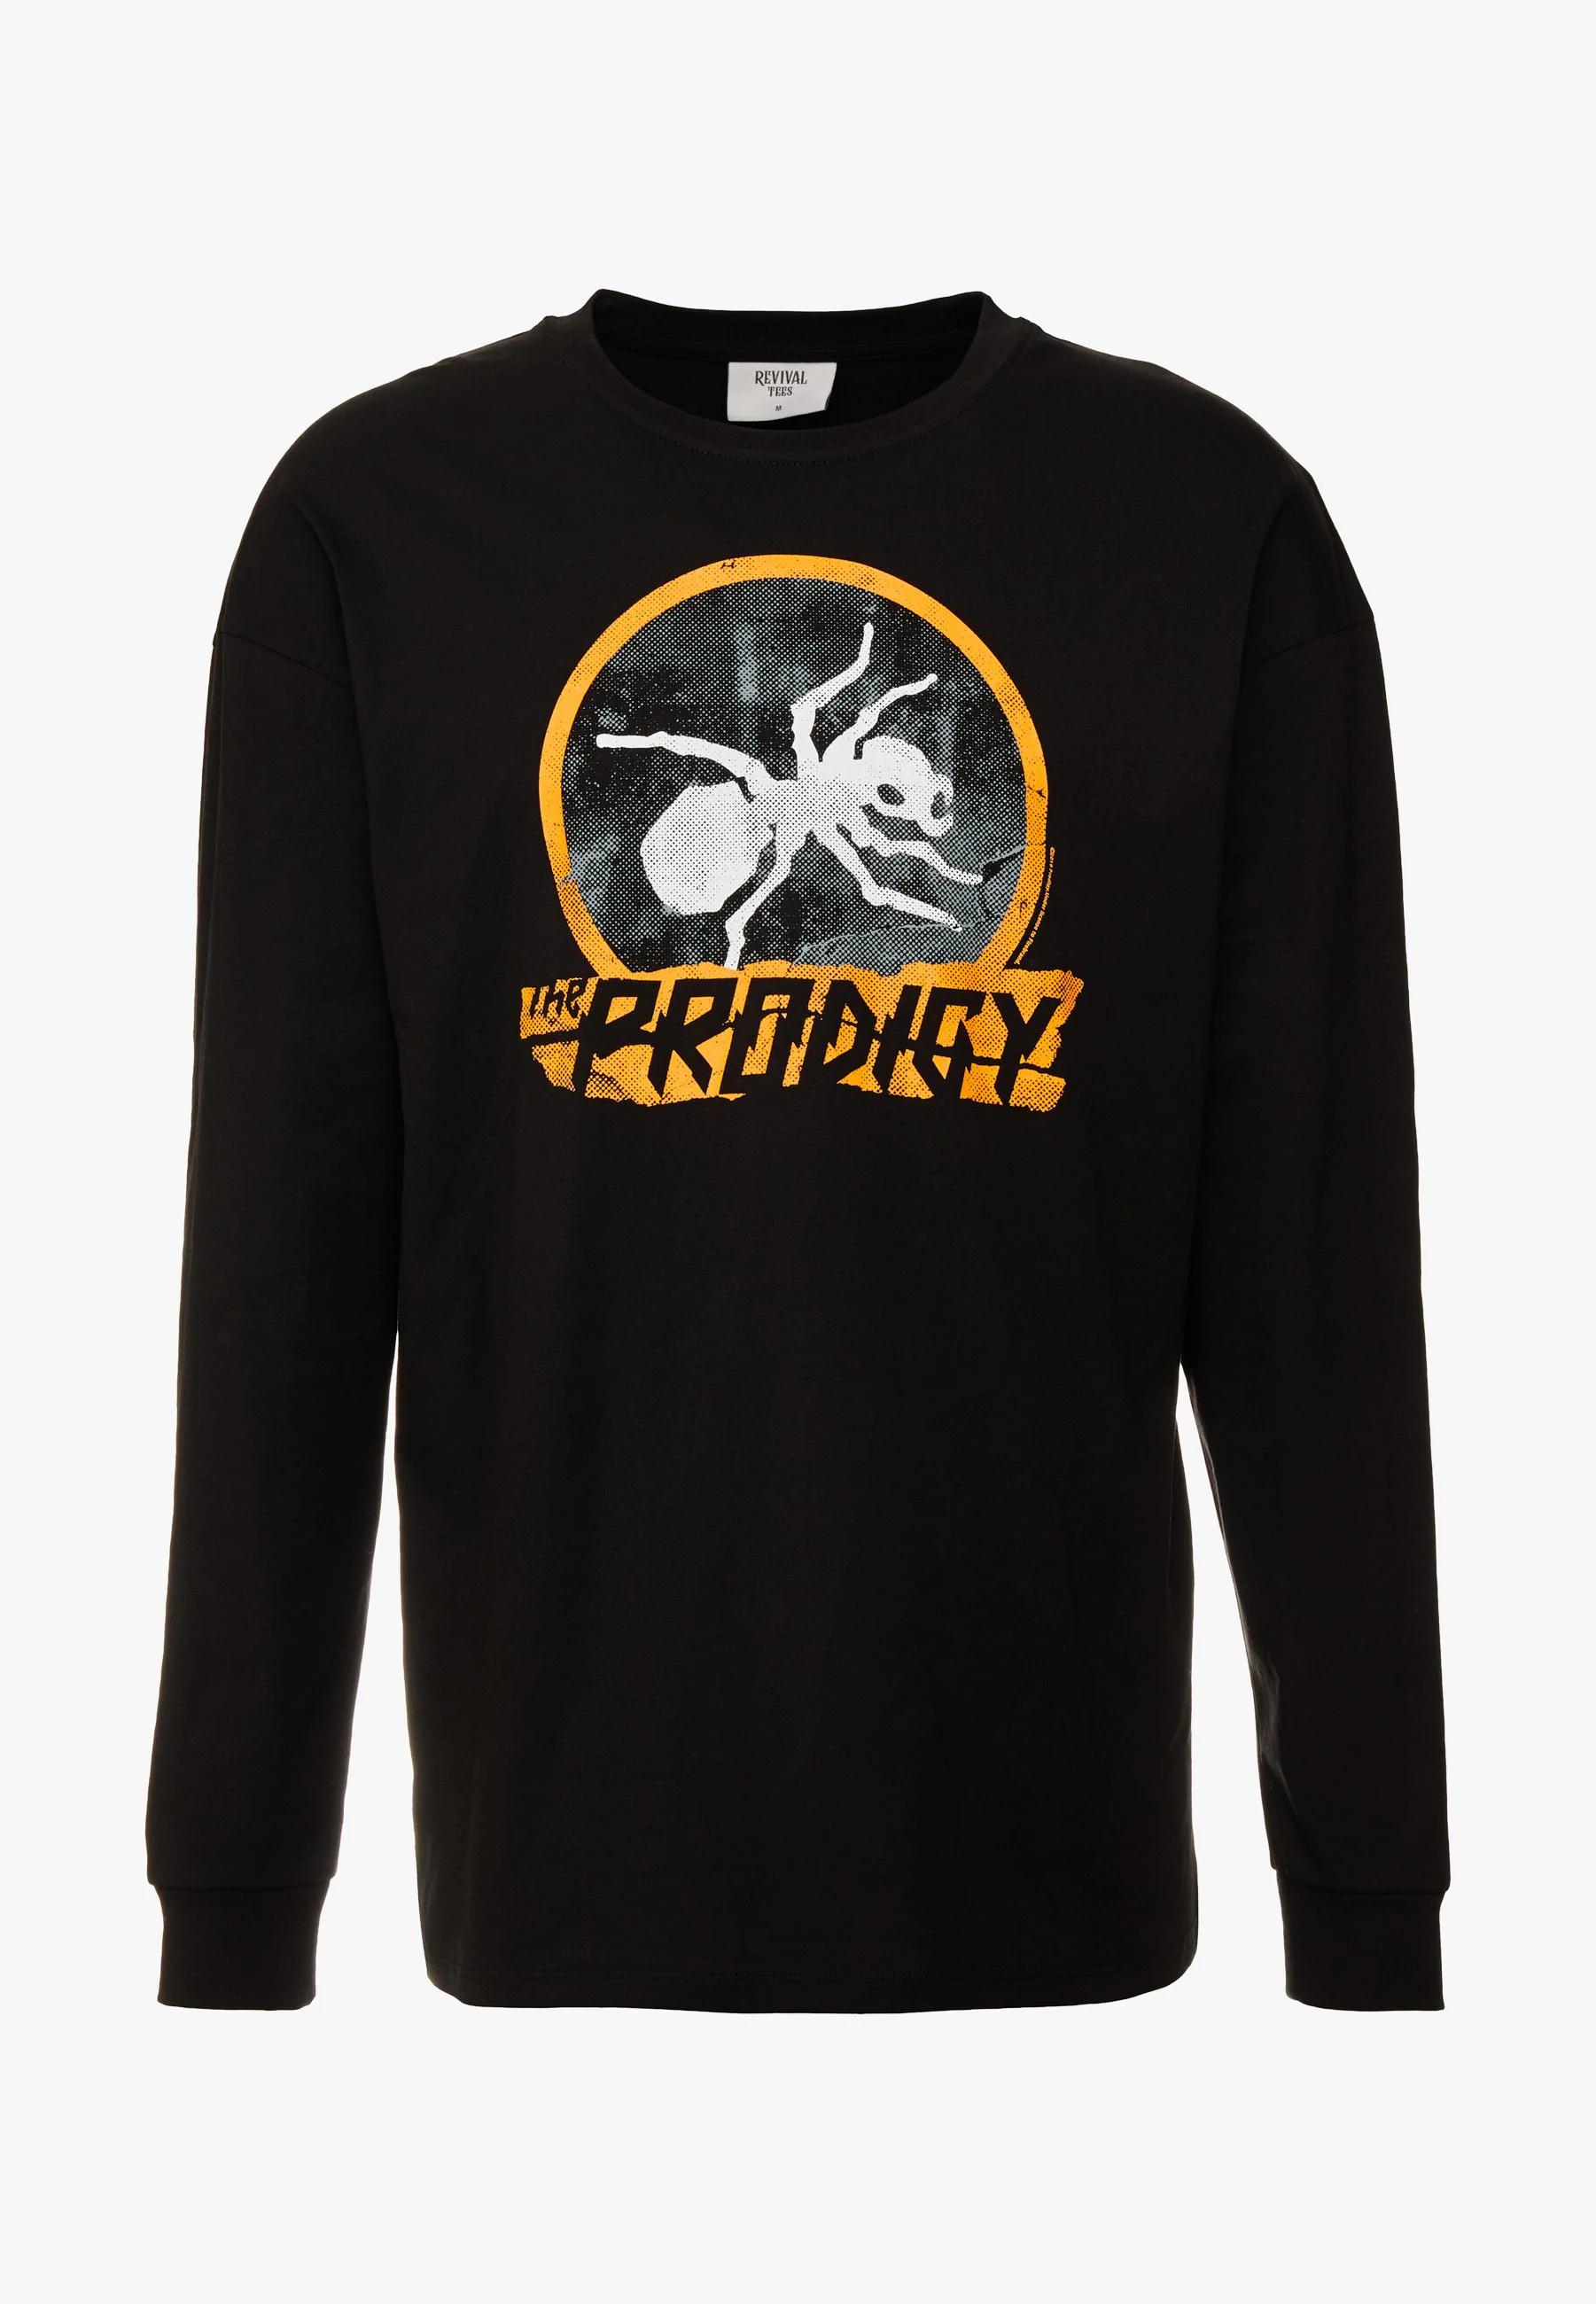 THE PRODIGY Langarm Shirt Gr.S-XXL für 10,45€ (Cyber Deal) @ Zalando